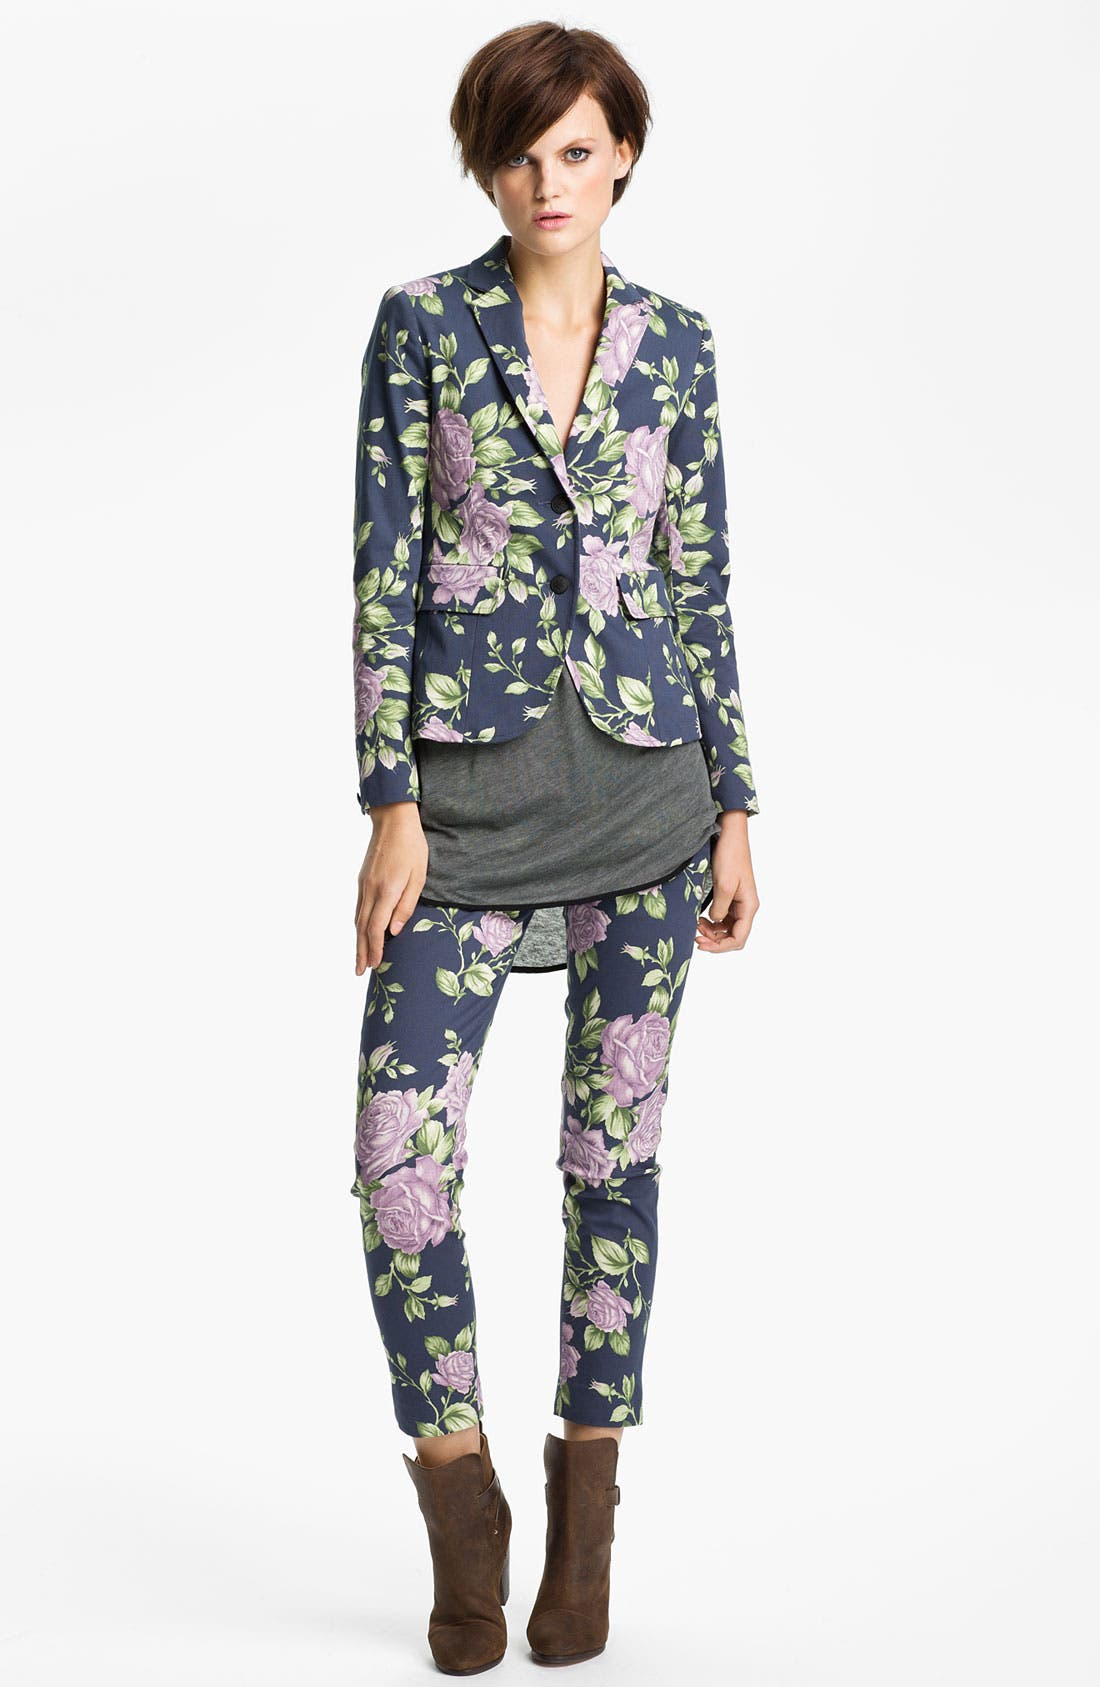 Alternate Image 1 Selected - rag & bone 'Bailey' Floral Print Jacket